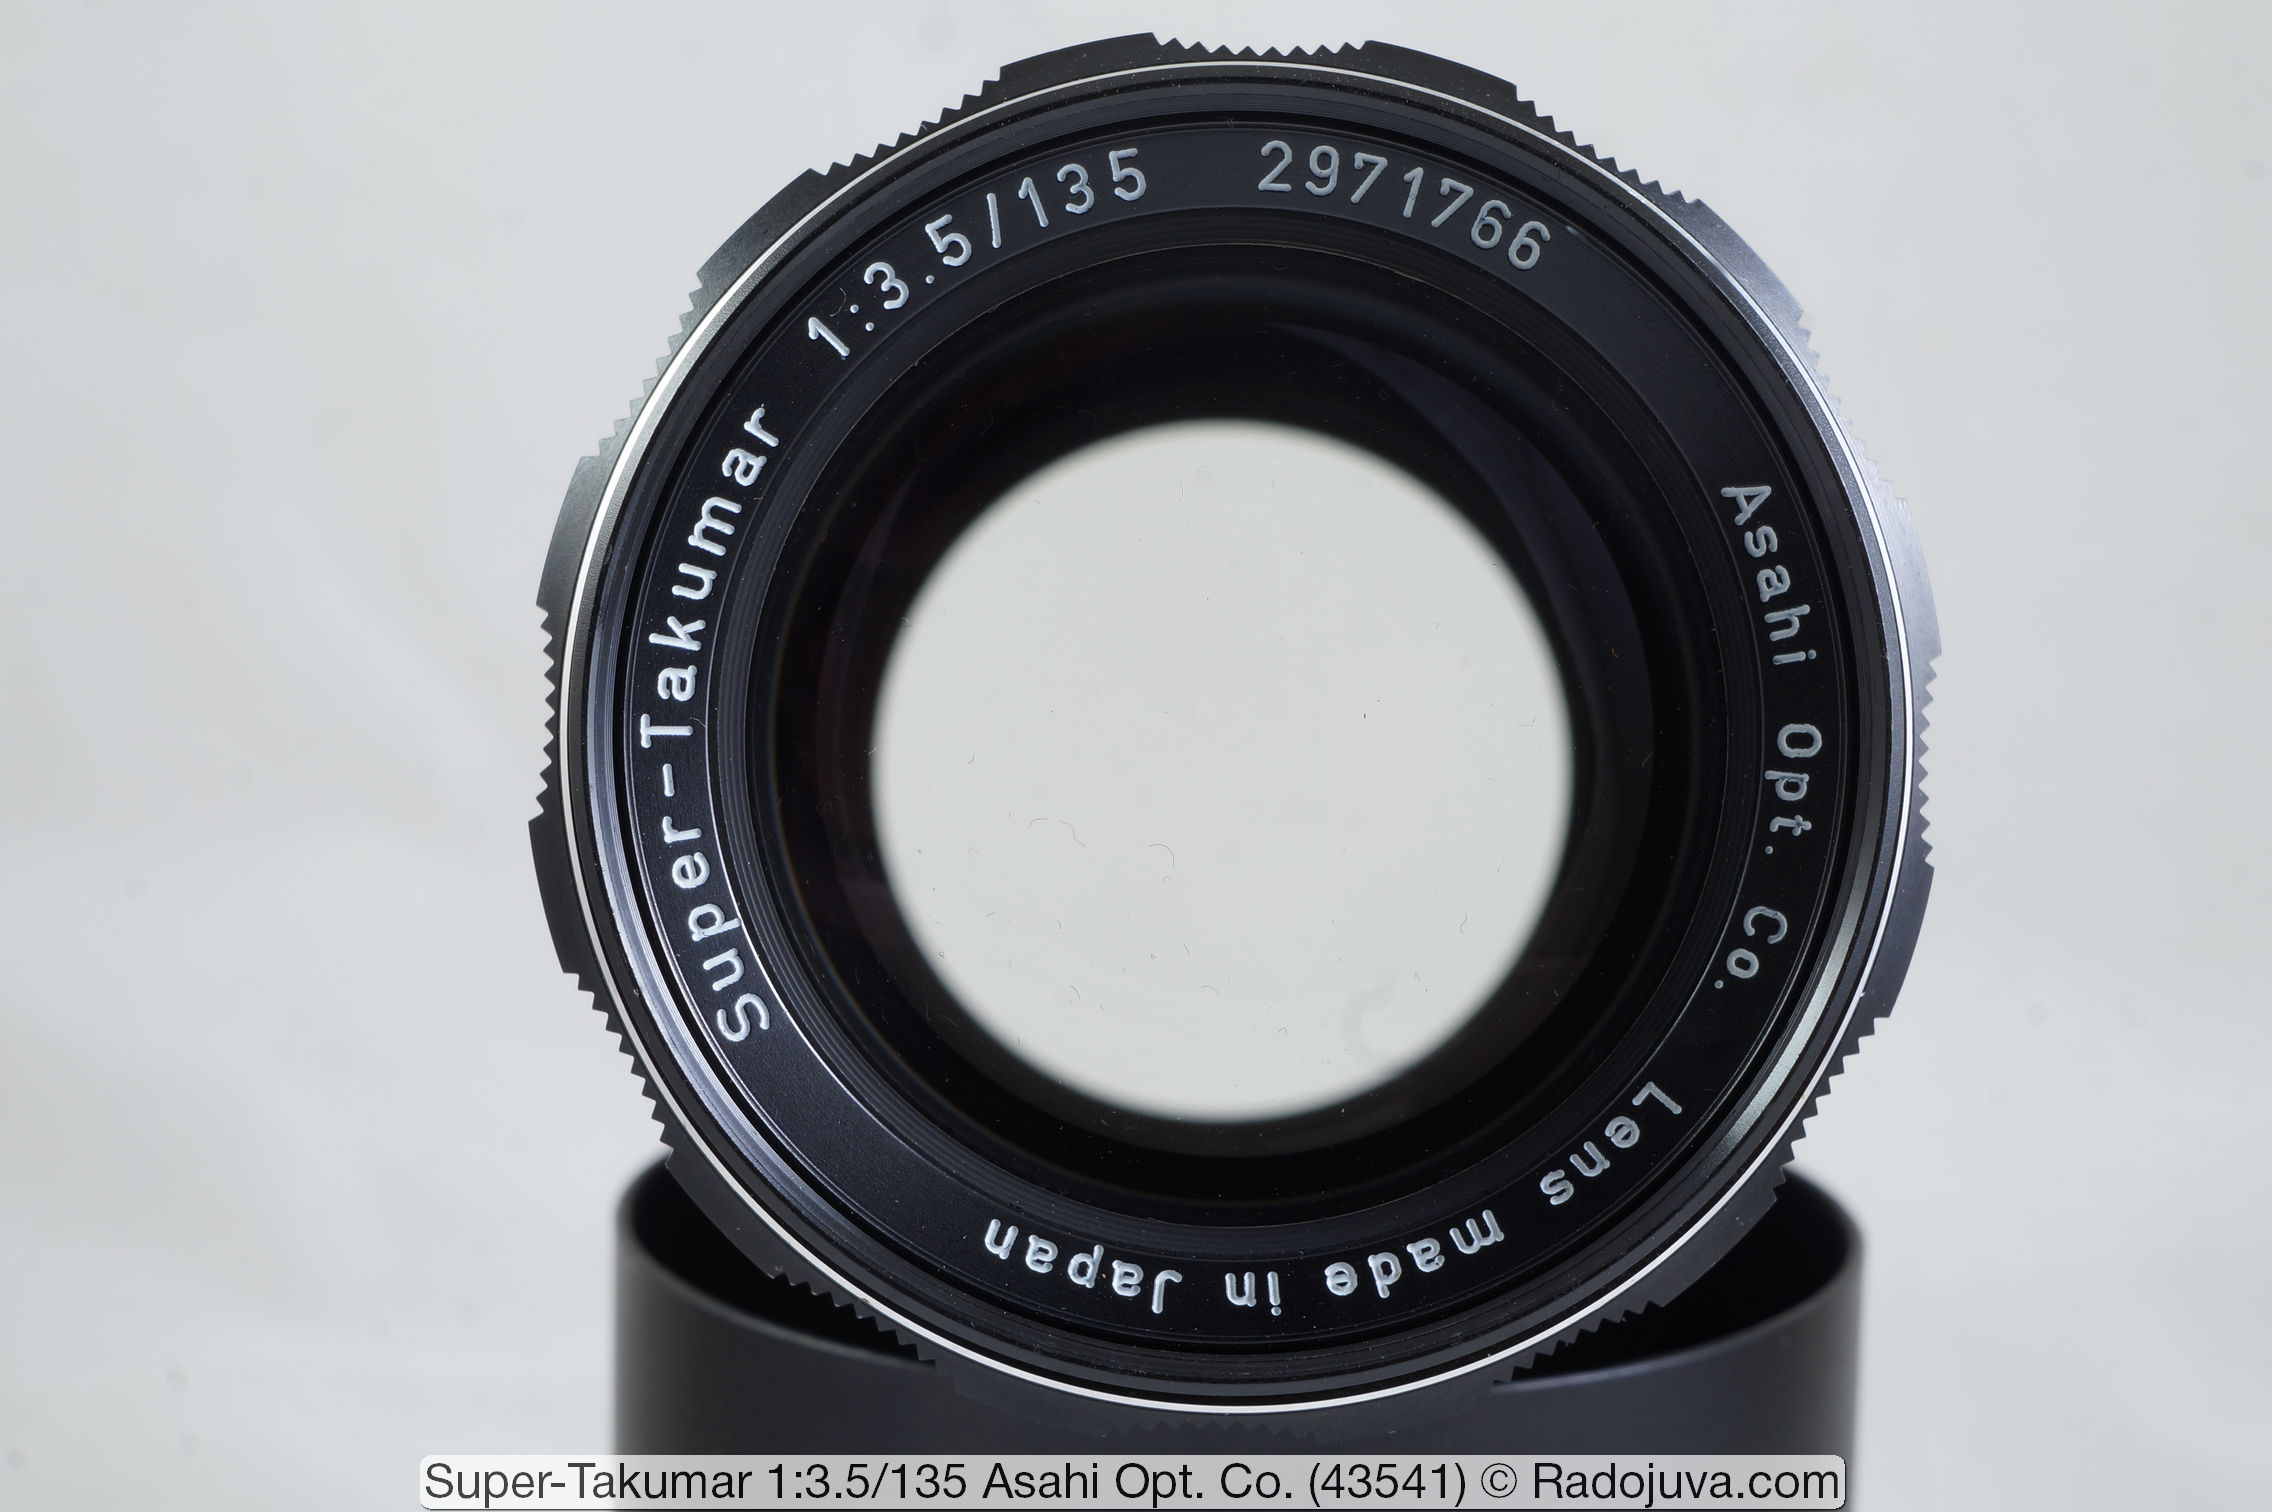 Super-Takumar 1:3.5/135 Asahi Opt. Co.